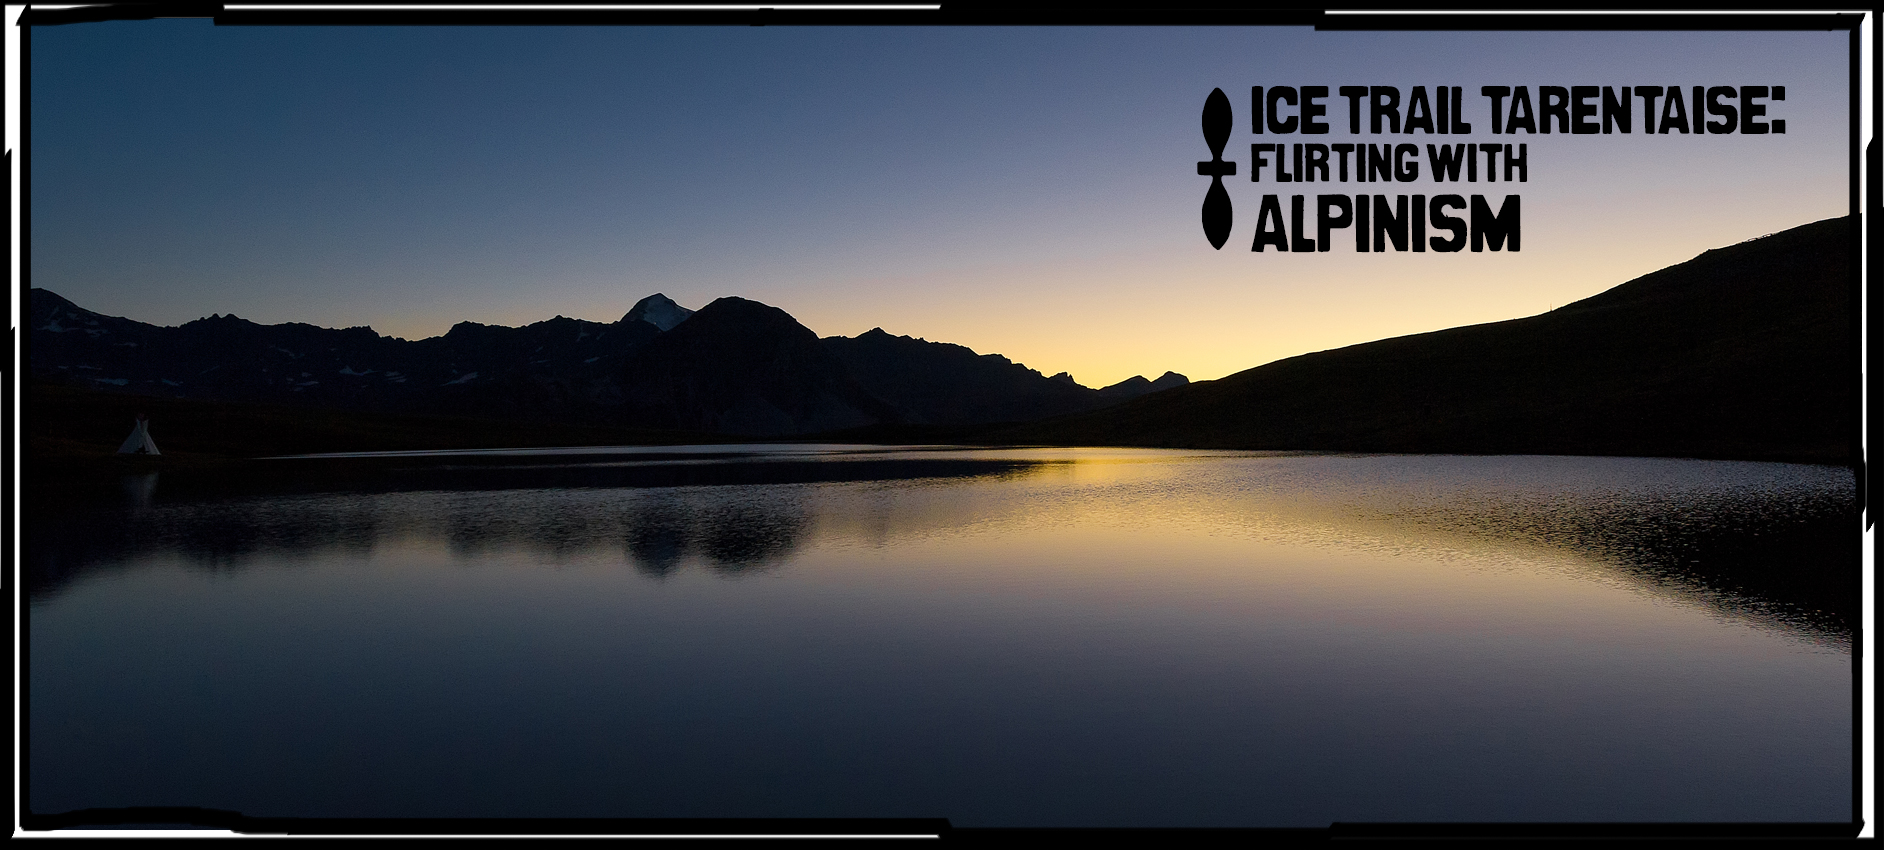 Ice Trail Tarentaise